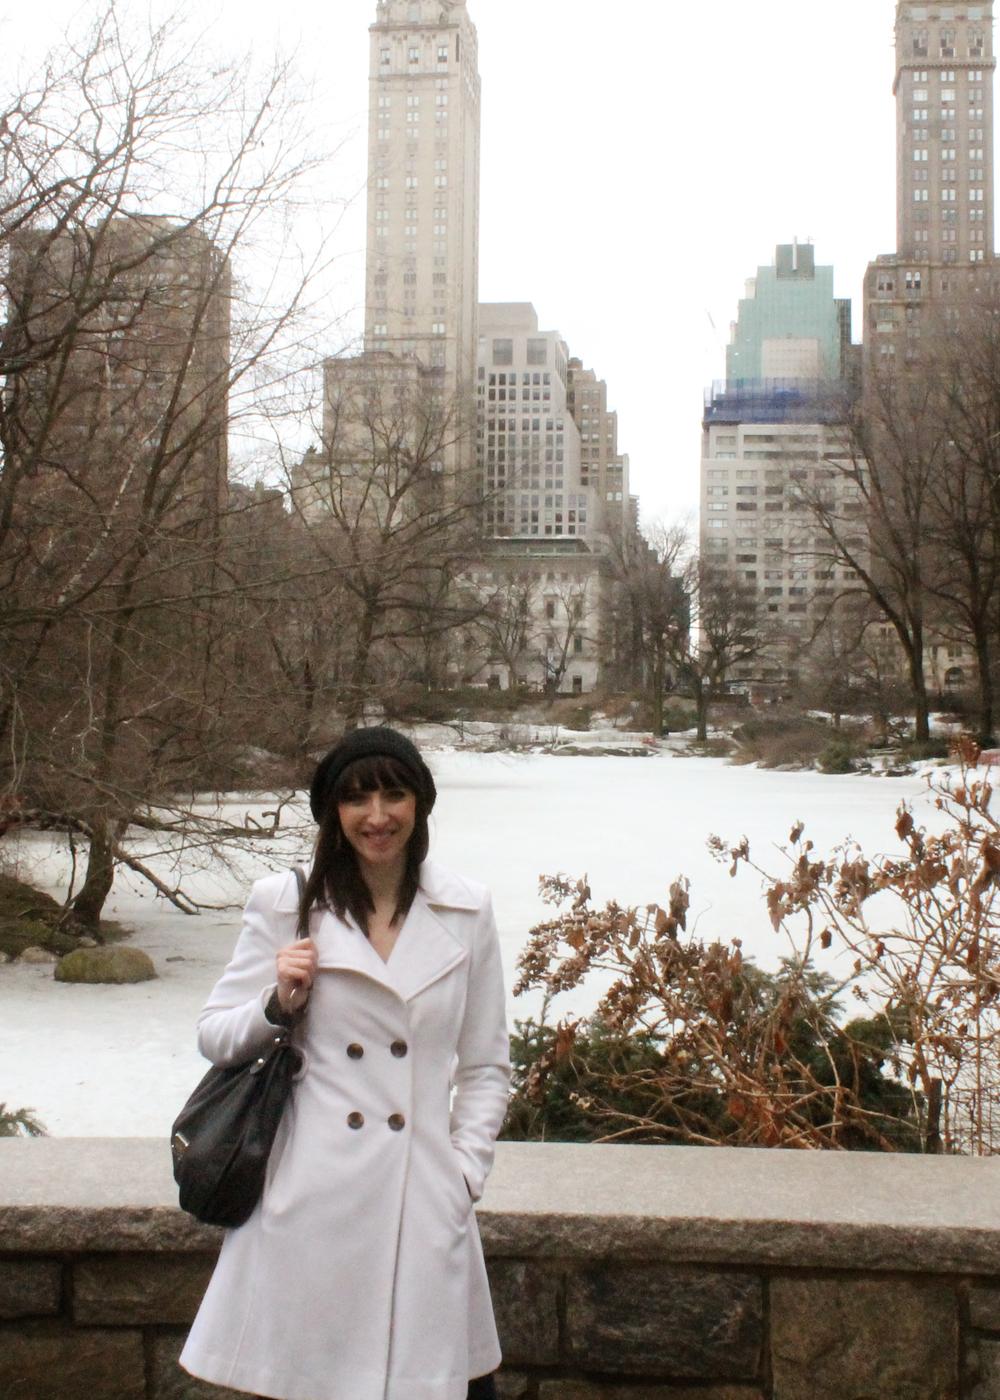 In Central Park || MrsRobbinsSparkles.com